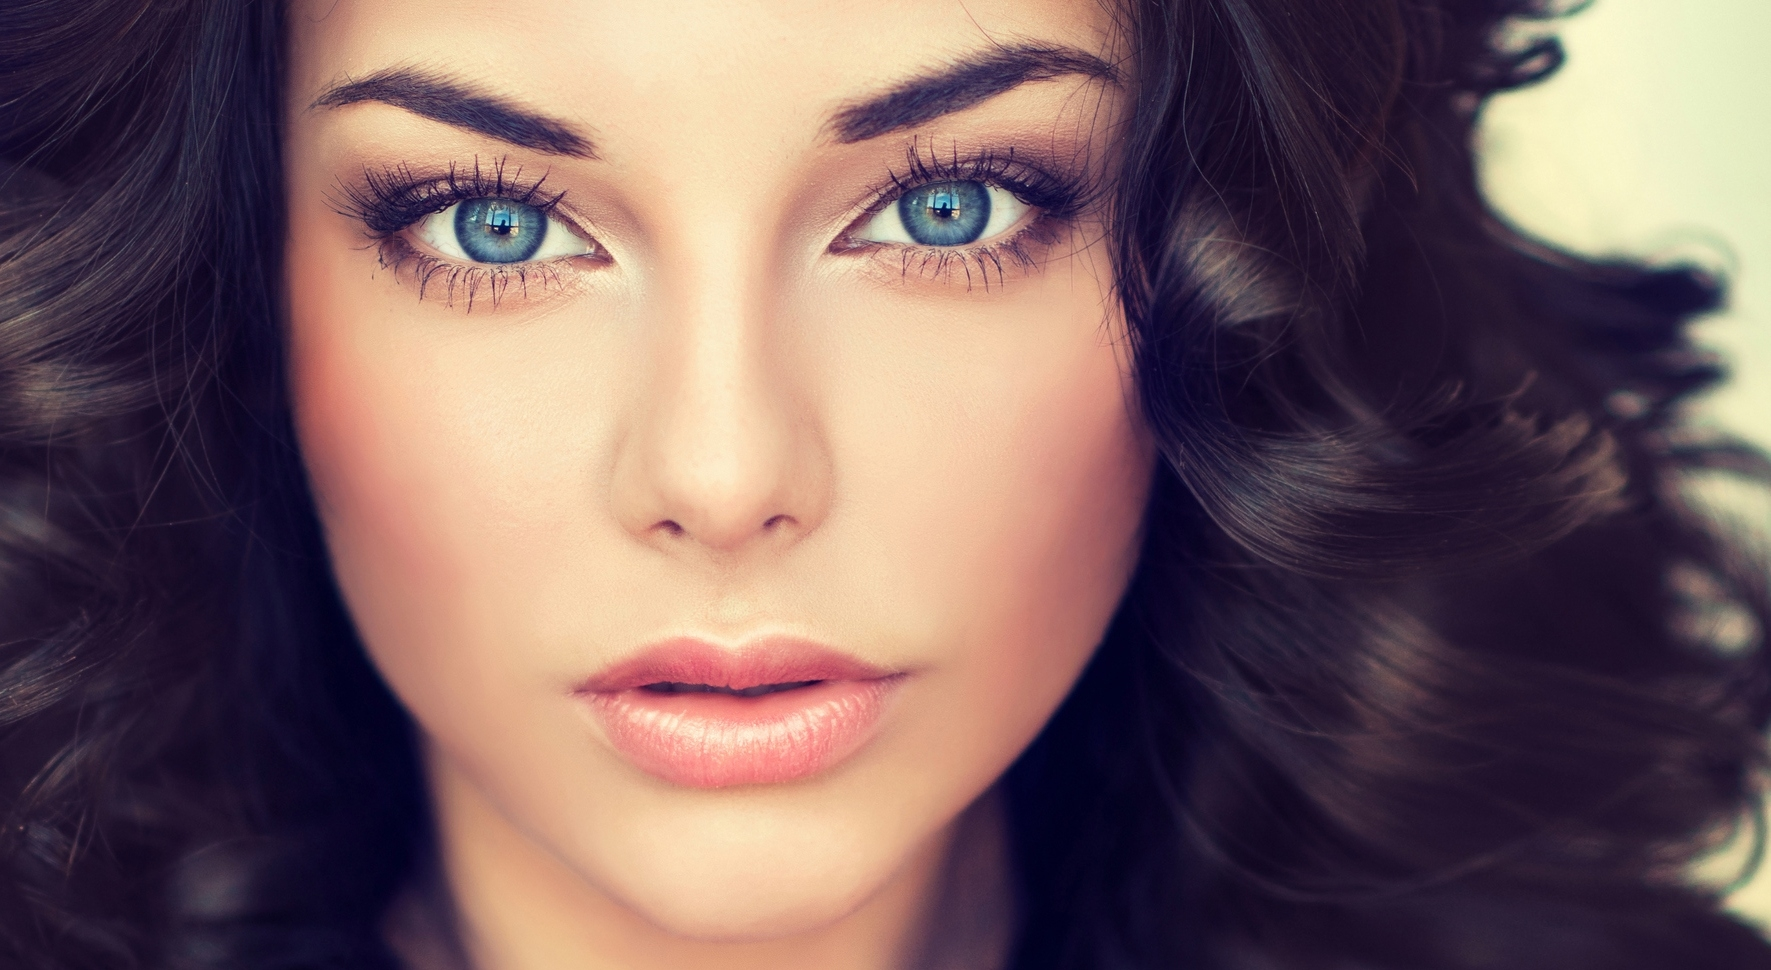 Best Eye Shadow Colors For Blue Eyes | Lovetoknow regarding What Color Eyeshadow For Blue Eyes And Black Hair